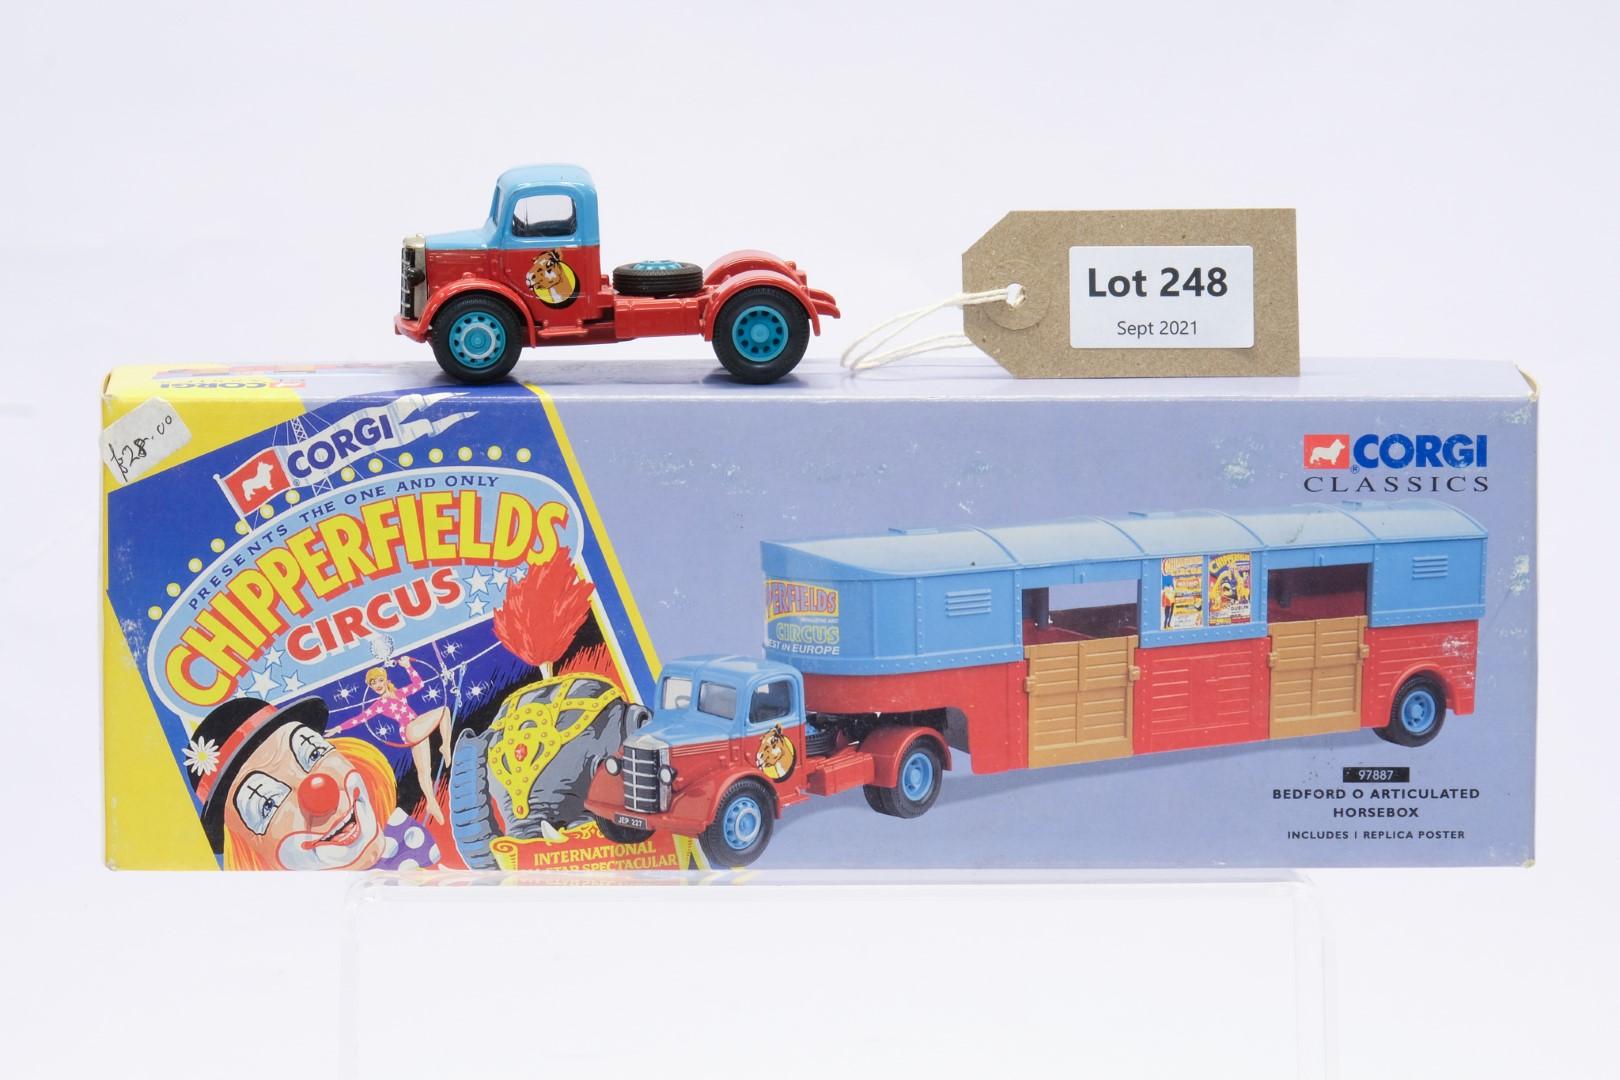 Corgi Bedford O Articulated Horsebox - Chipperfield's Circus - No Trailer